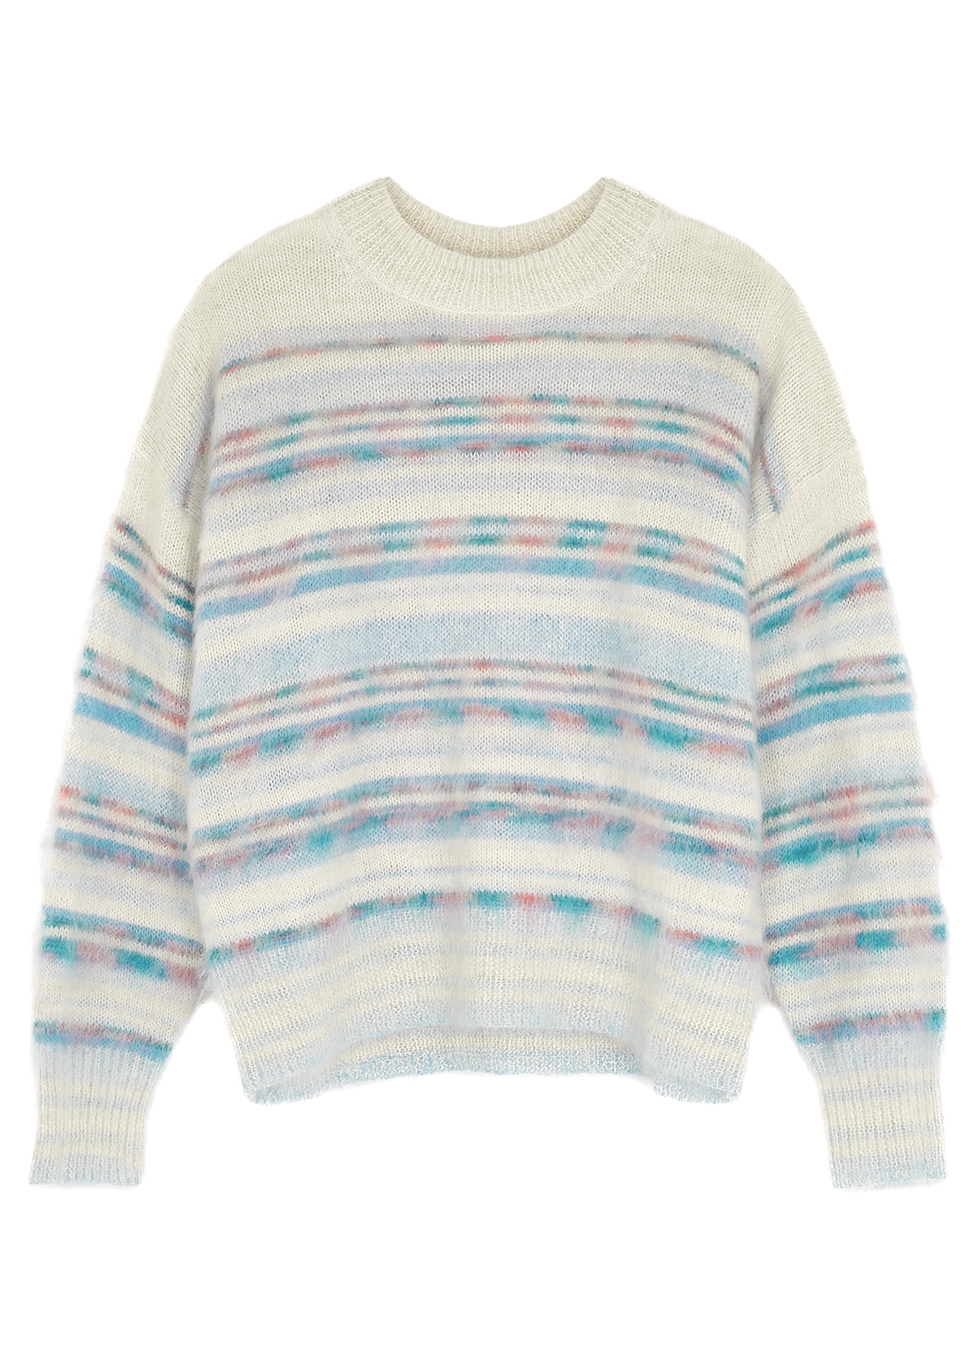 Gatliny striped alpaca-blend jumper